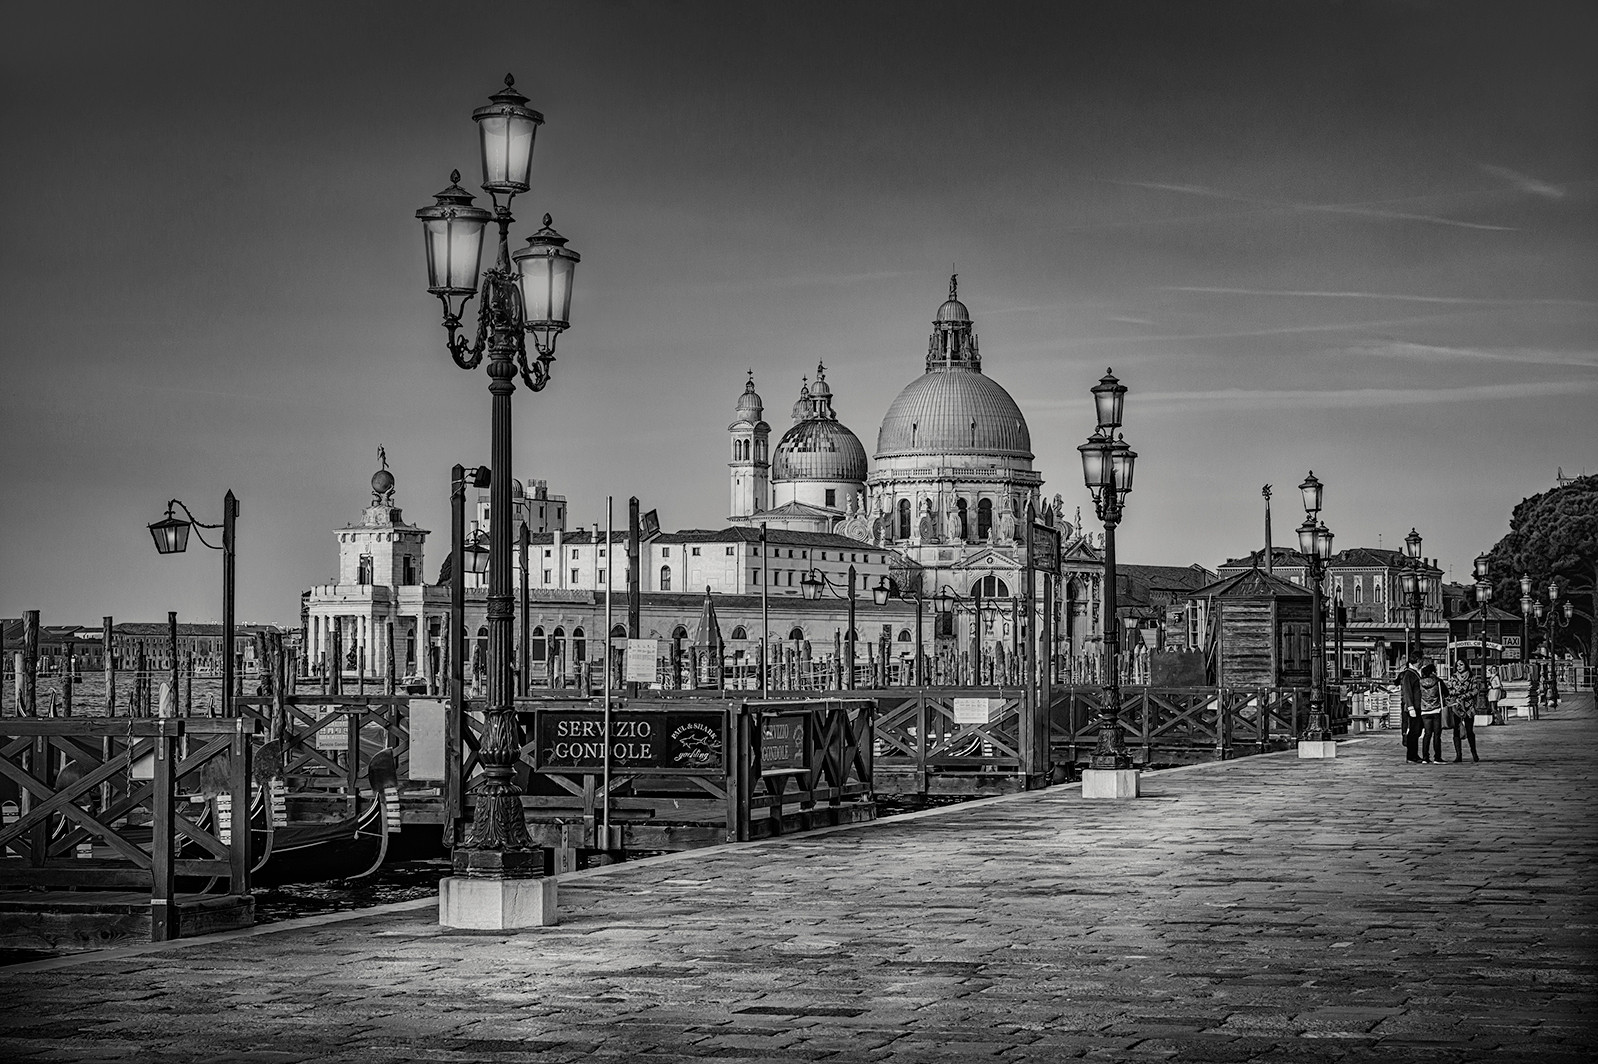 MONO - Morning Light Venice by Matthew Canning (7.5 marks)